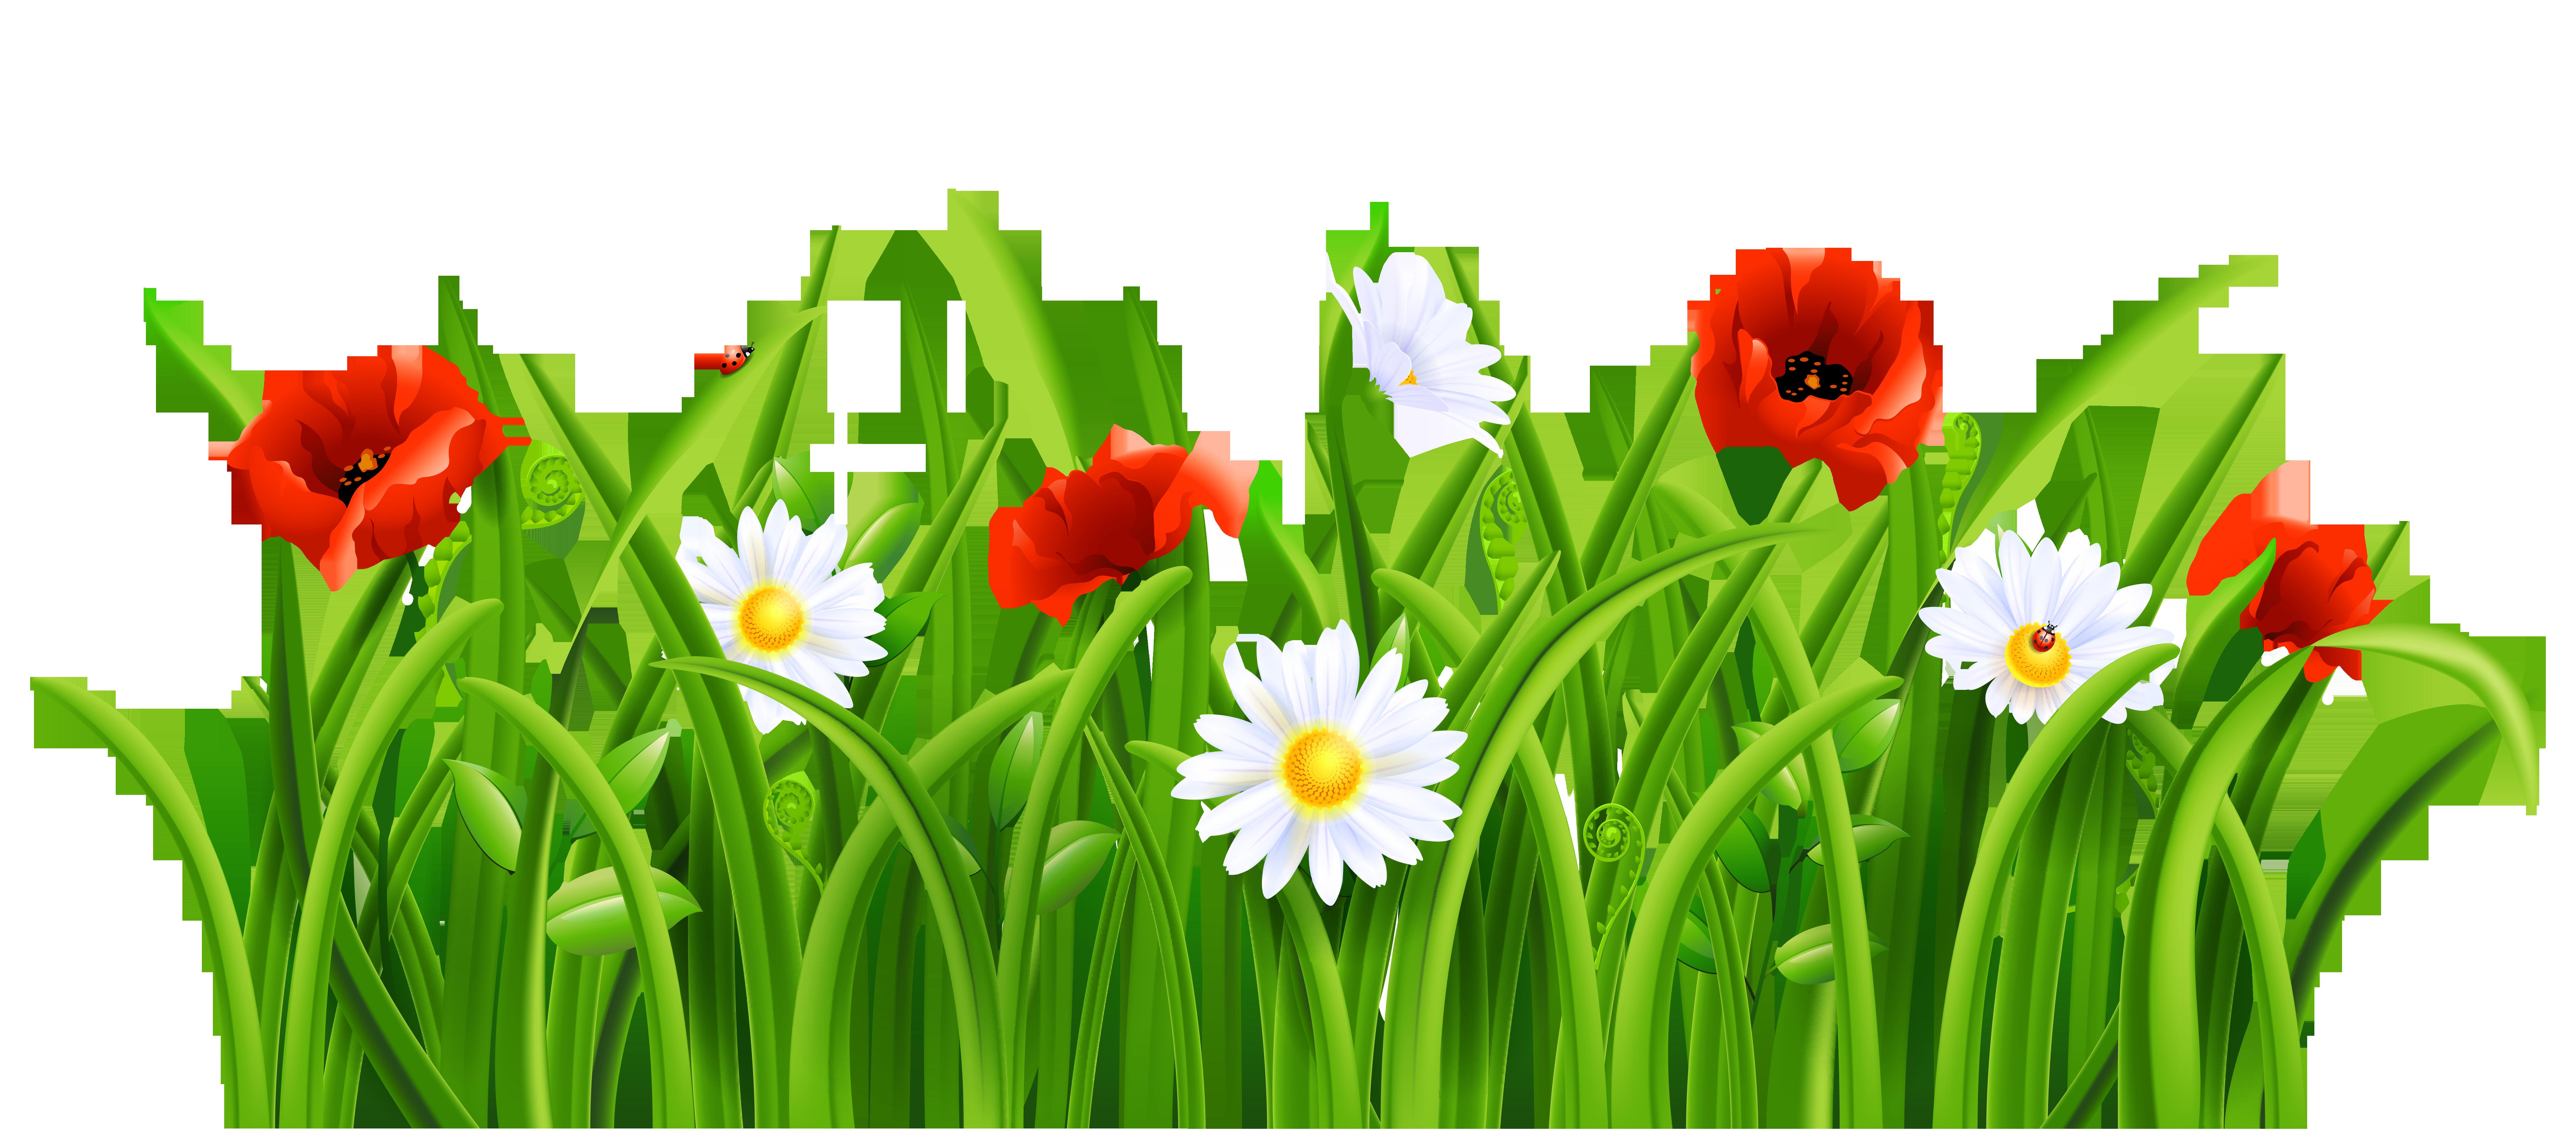 Spring Grass Clip Art